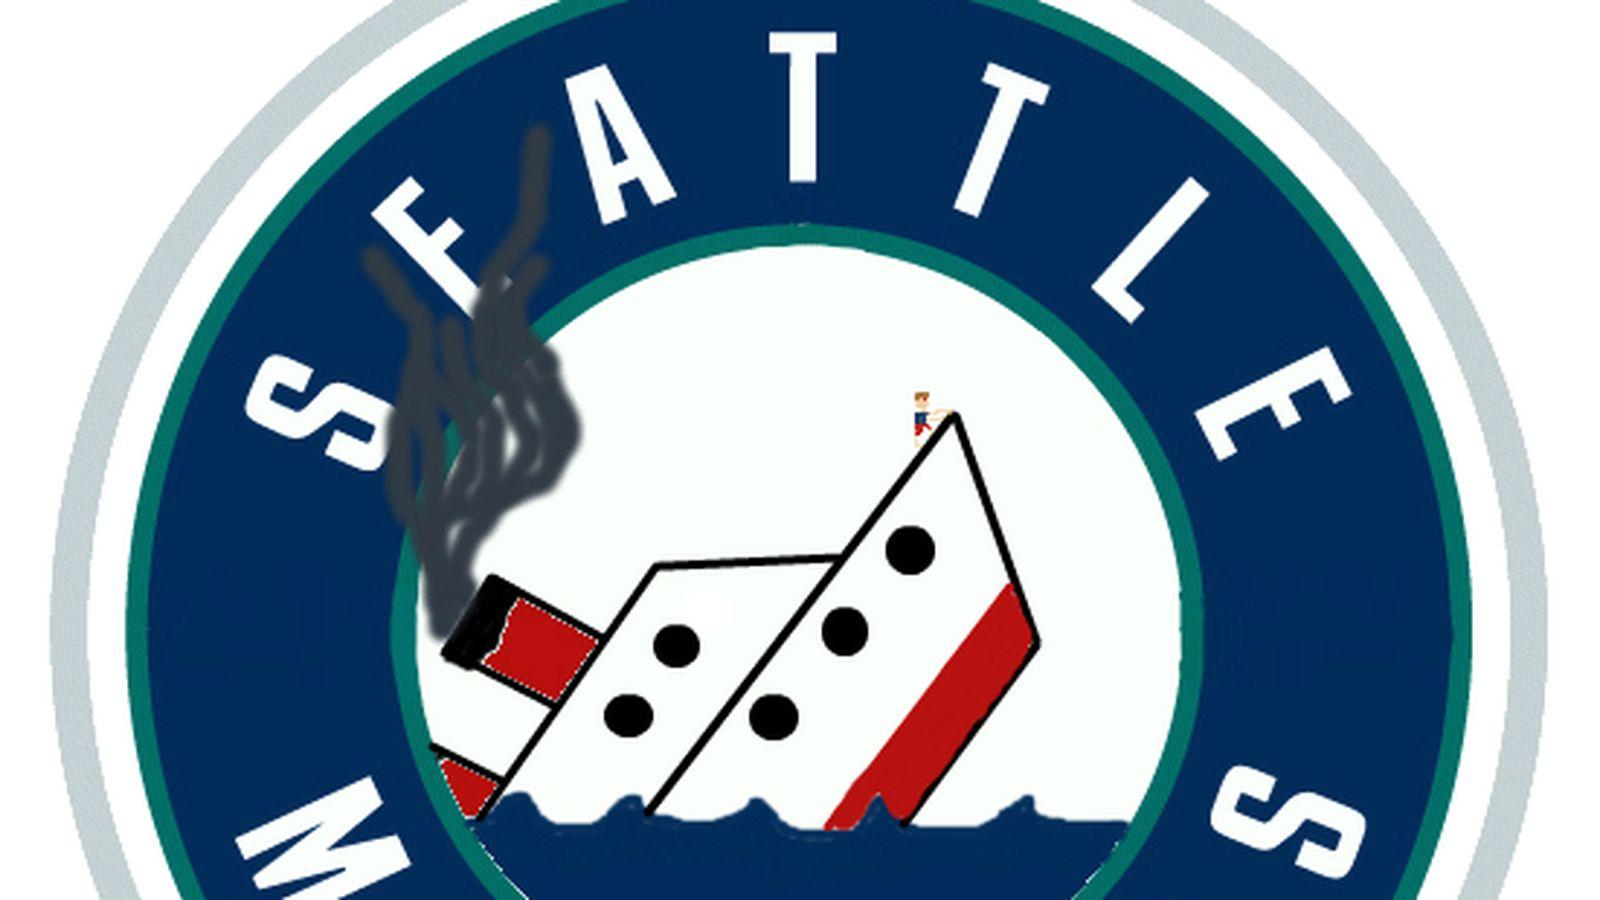 Seattle Mariners New Logo Design Club - Lookout Landing